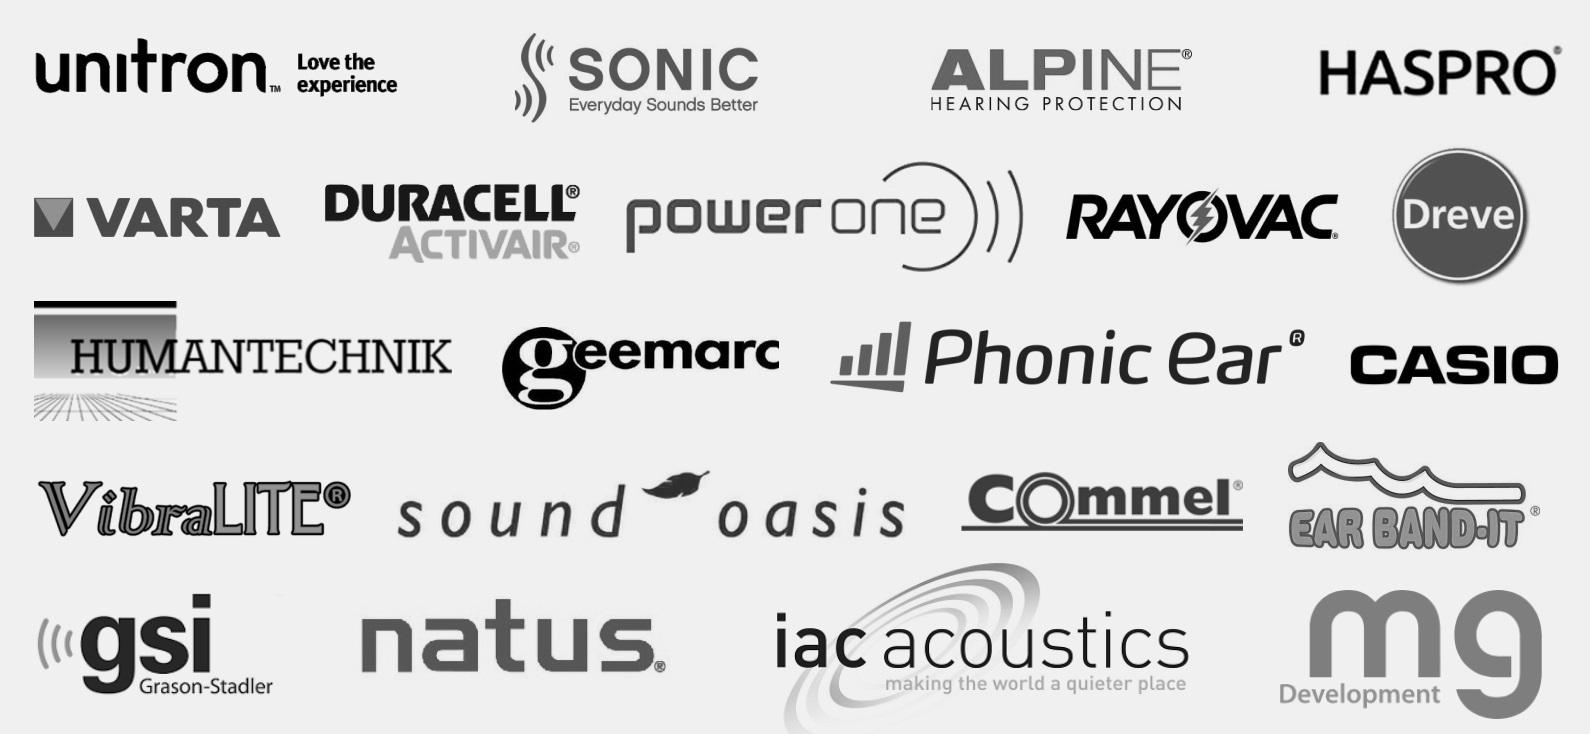 Blagovne-znamke-Unitron-Sonic-Varta-Duracell-Rayovac-Alpine-in-druge-AUDIO-BM-slusni-aparati-centri